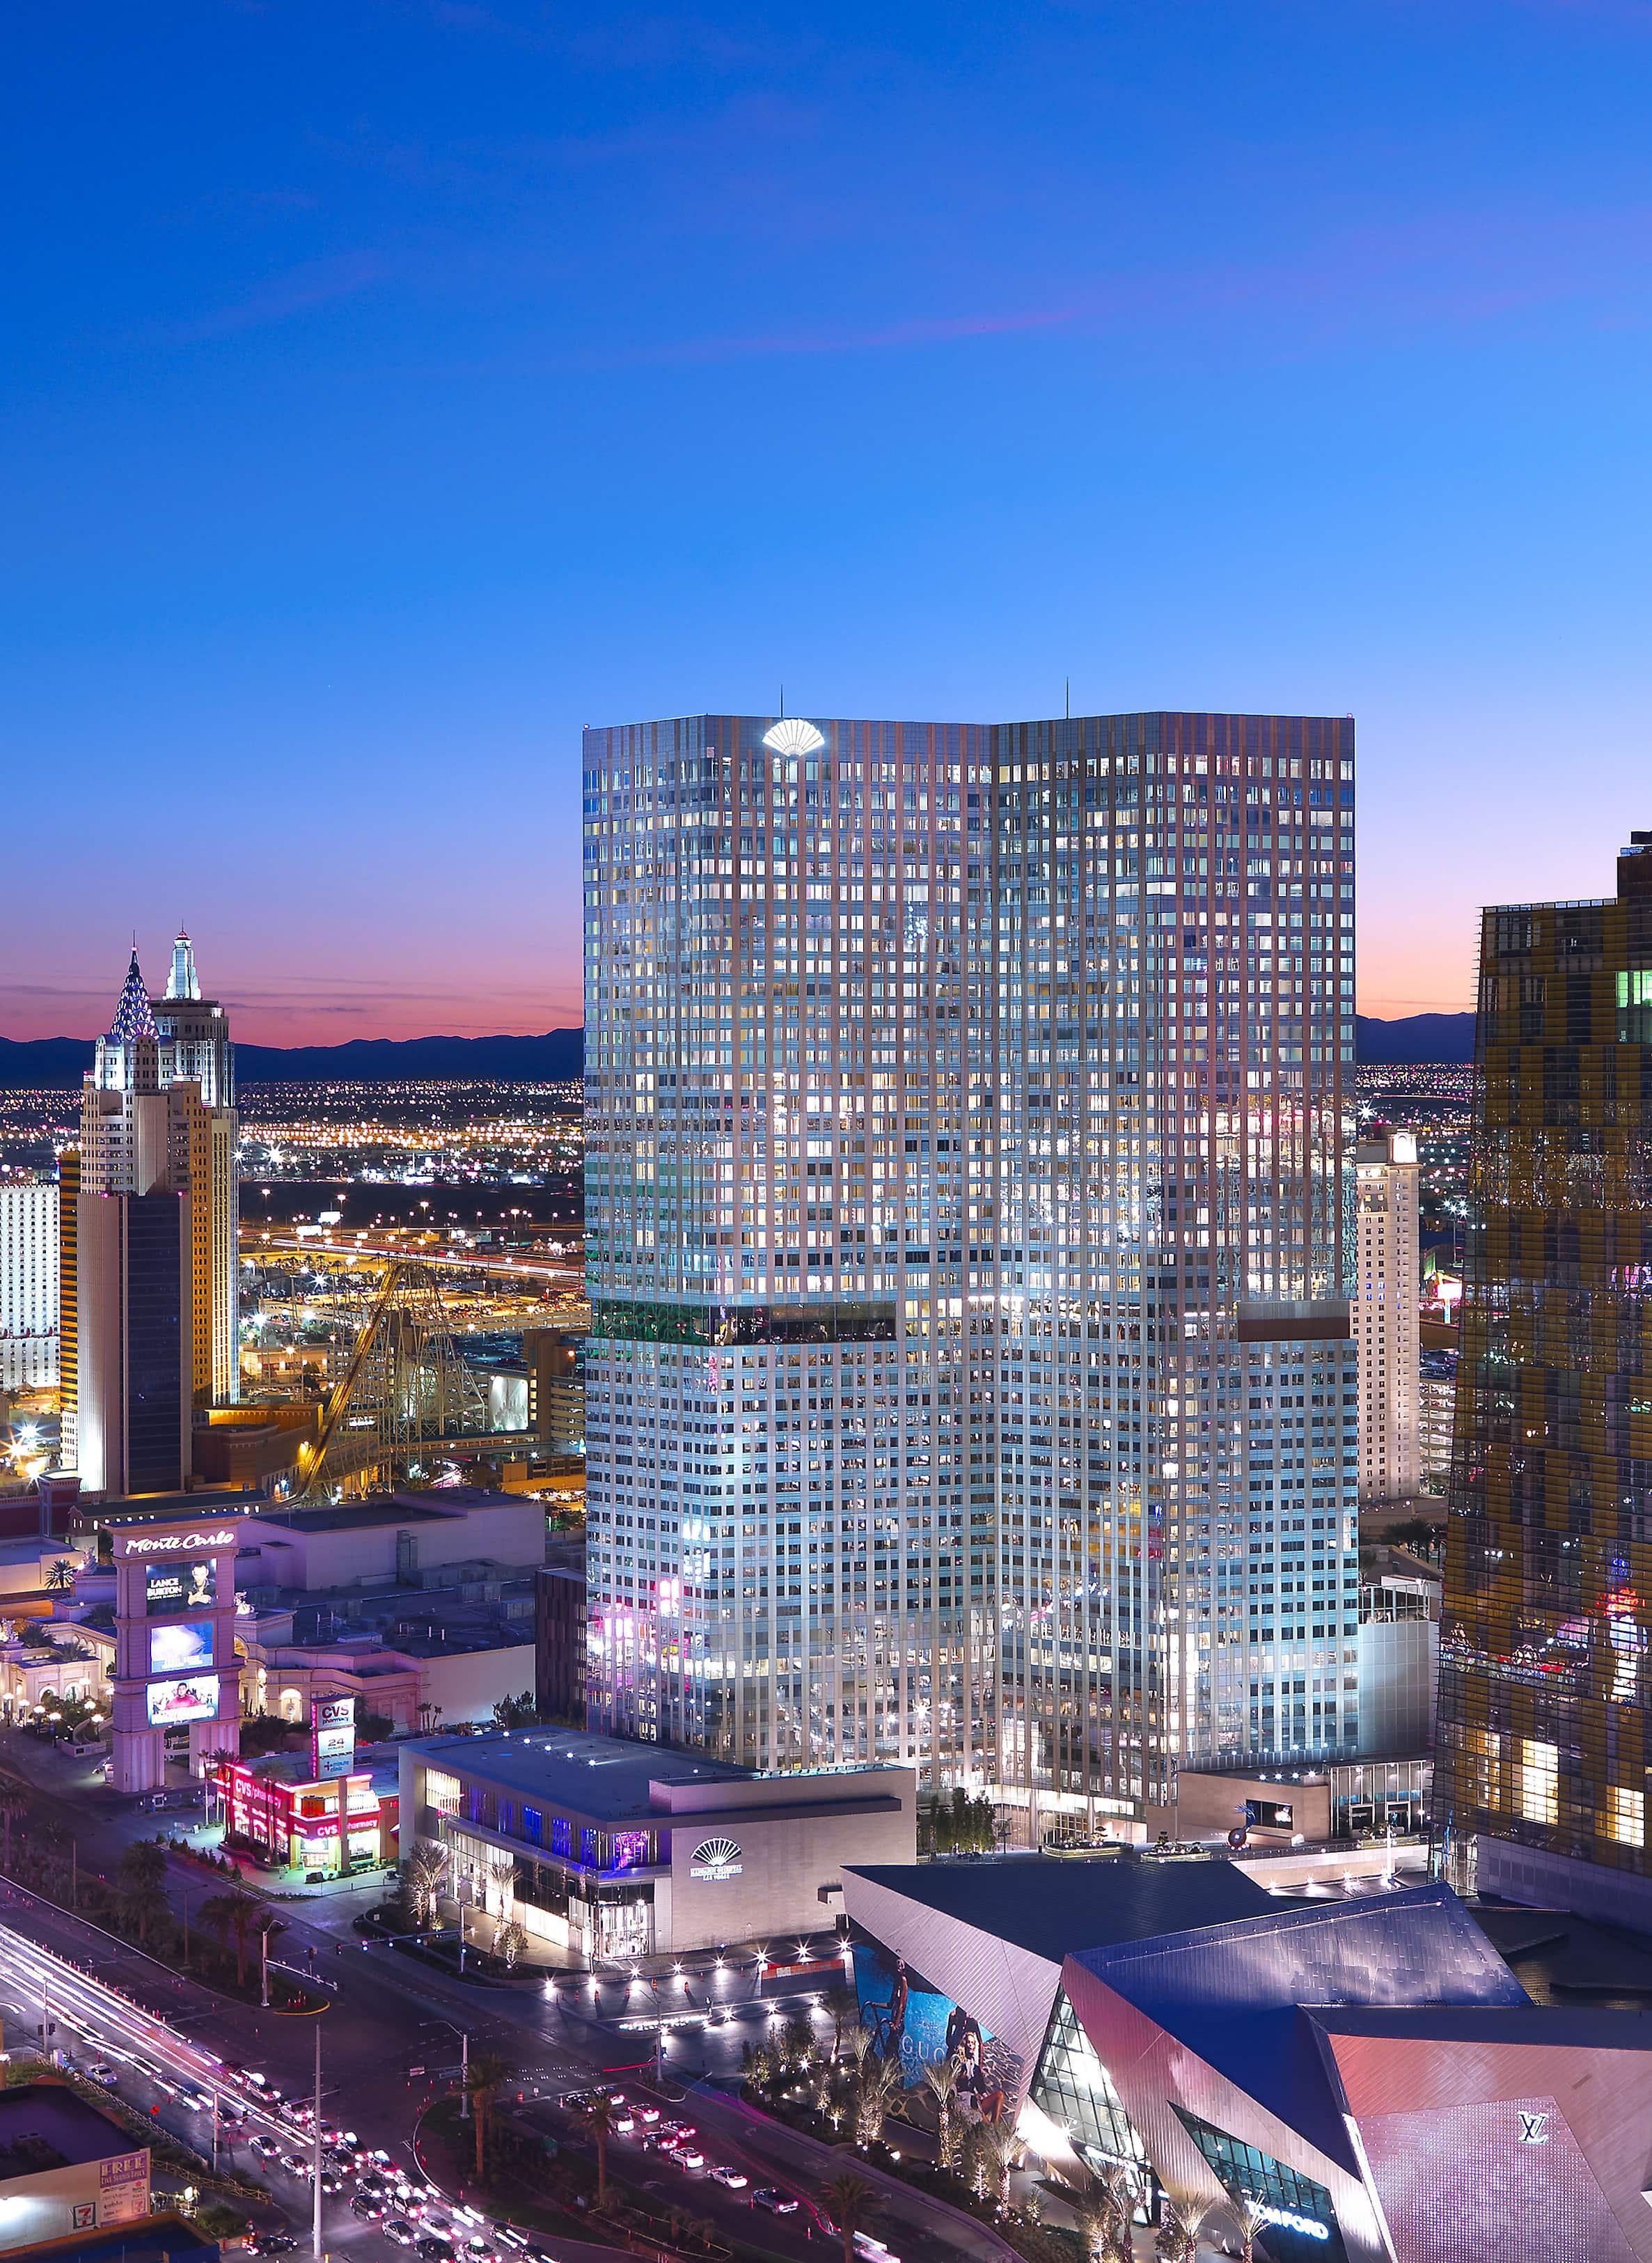 Reviews on Excelsior Hotel in Las Vegas, NV - Luxor Hotel and Casino Las Vegas, Caesars Palace Las Vegas Hotel & Casino, Mandalay Bay Resort & Casino, Hilton Lake Las Vegas Resort & Spa.